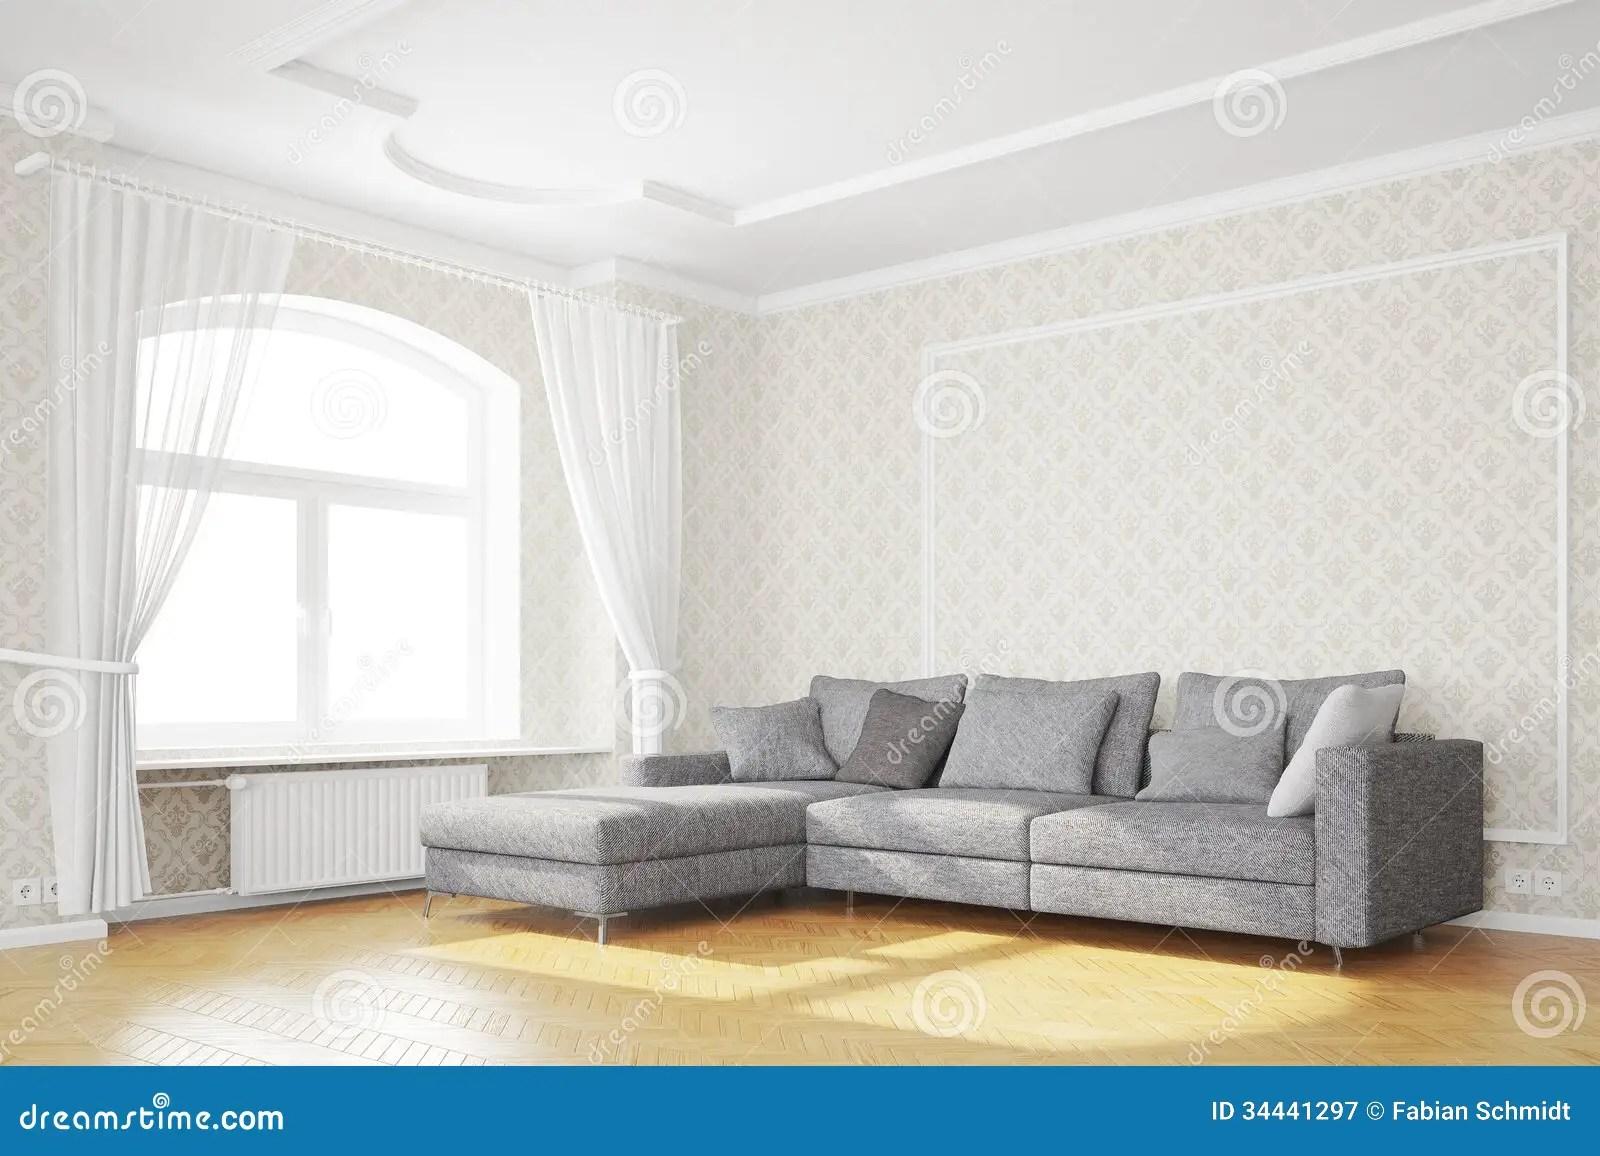 Minimal Living Room With Sofa Stock Illustration